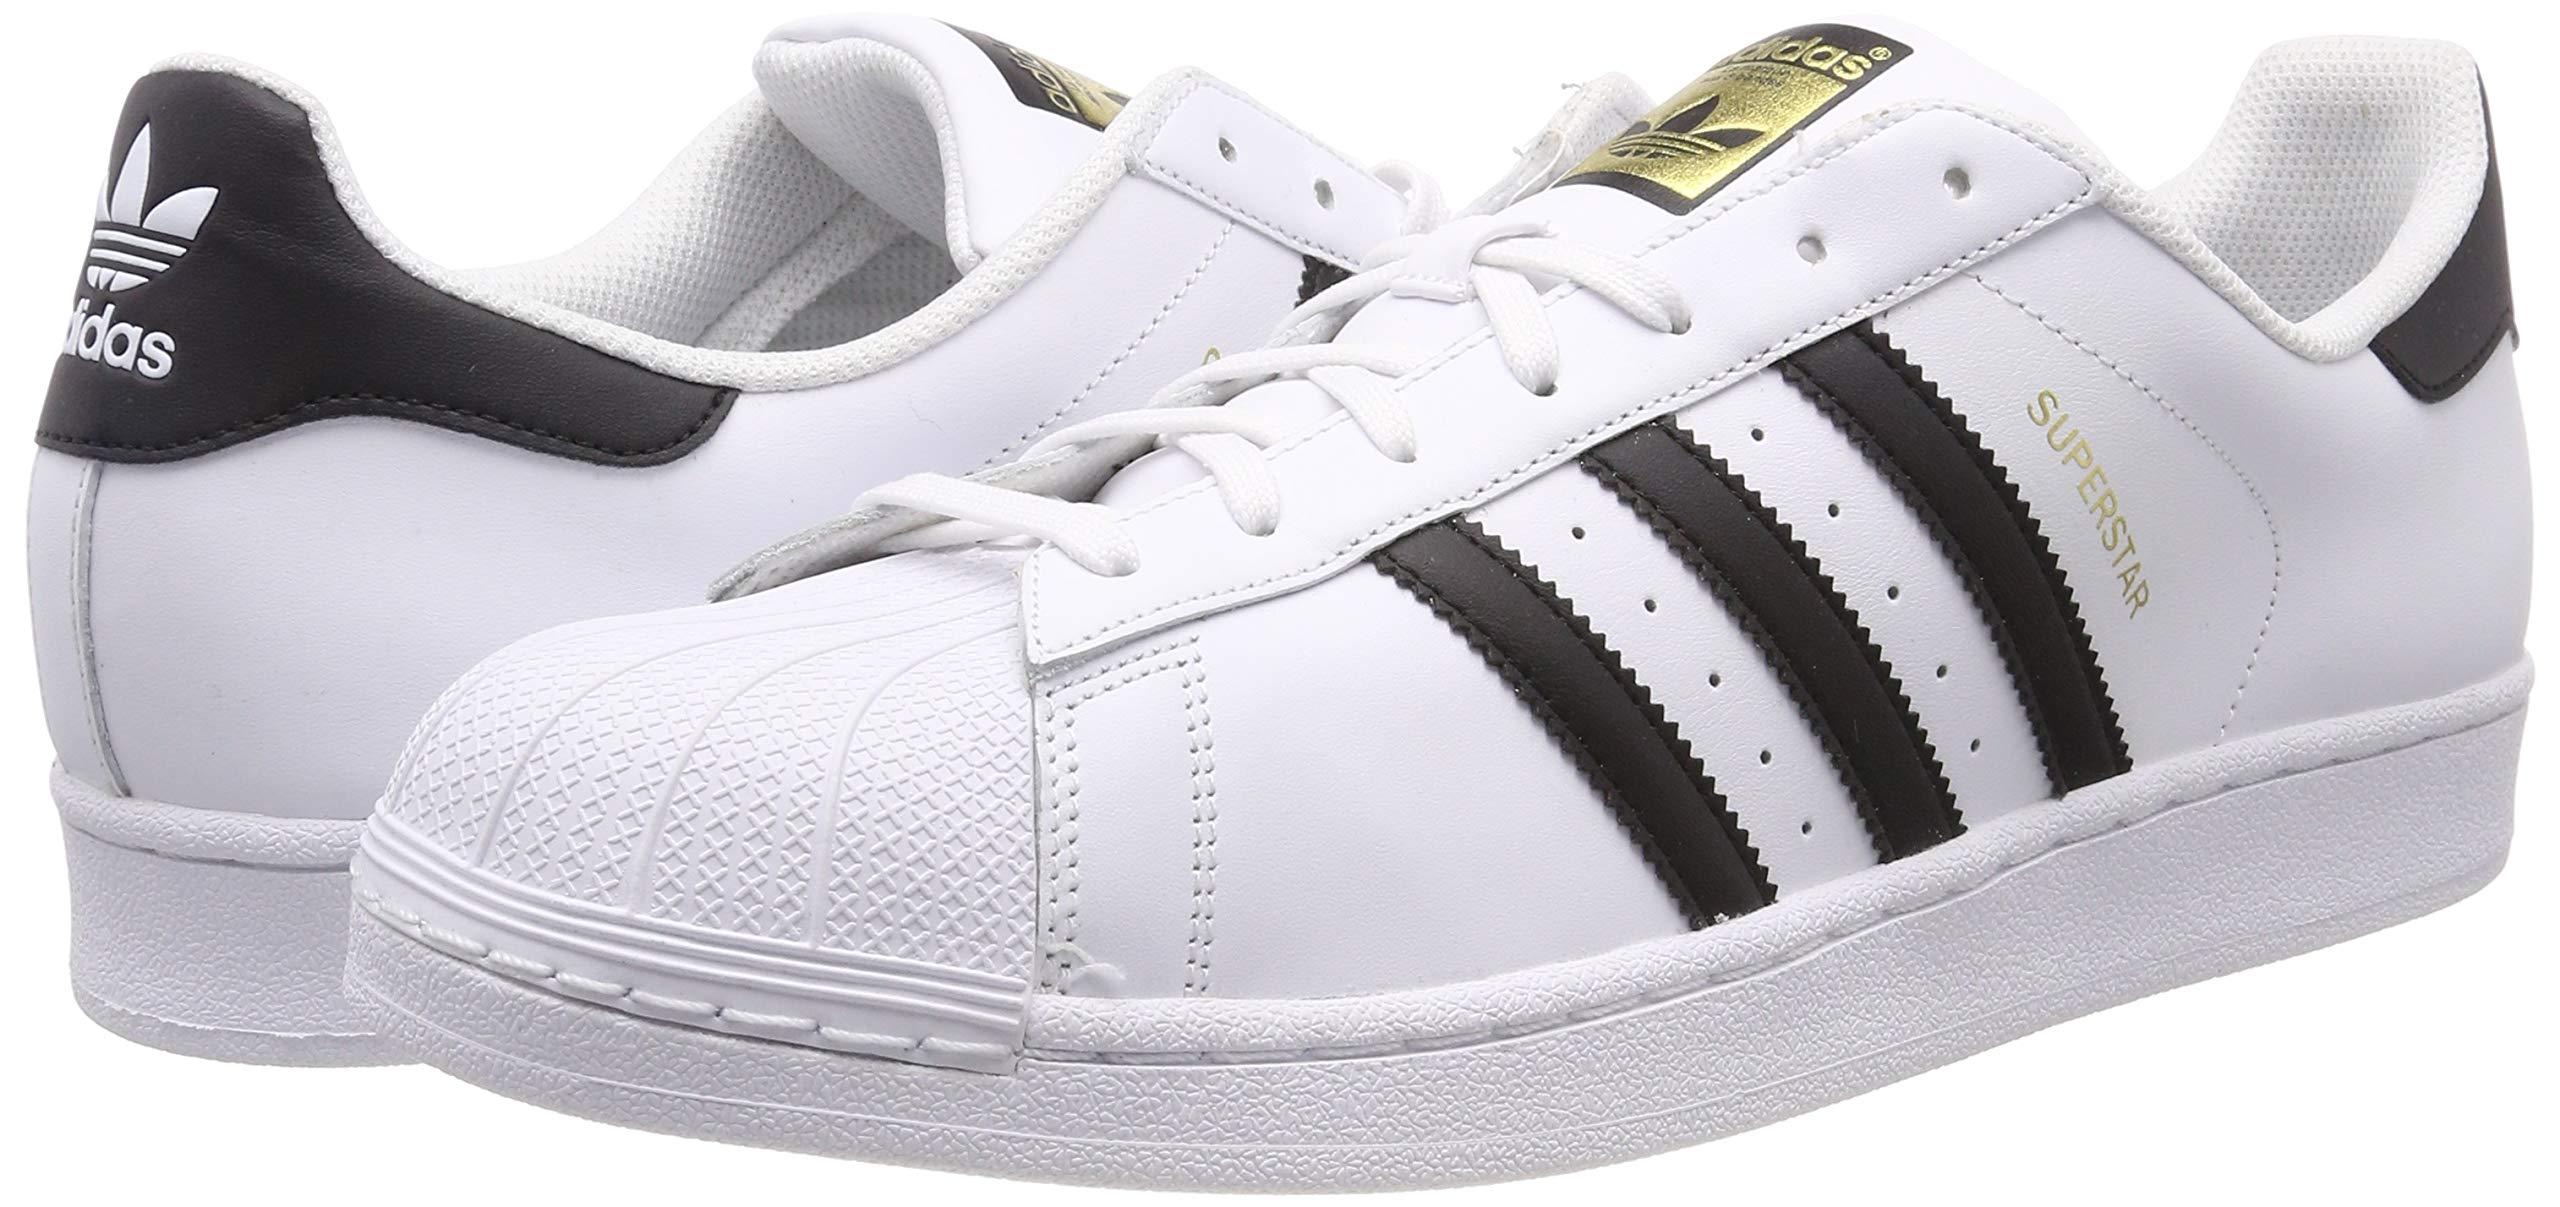 huge selection of 9a3a0 3bf97 Adidas Originals Superstar Scarpe da Ginnastica Unisex – Adulto, Bianco ...